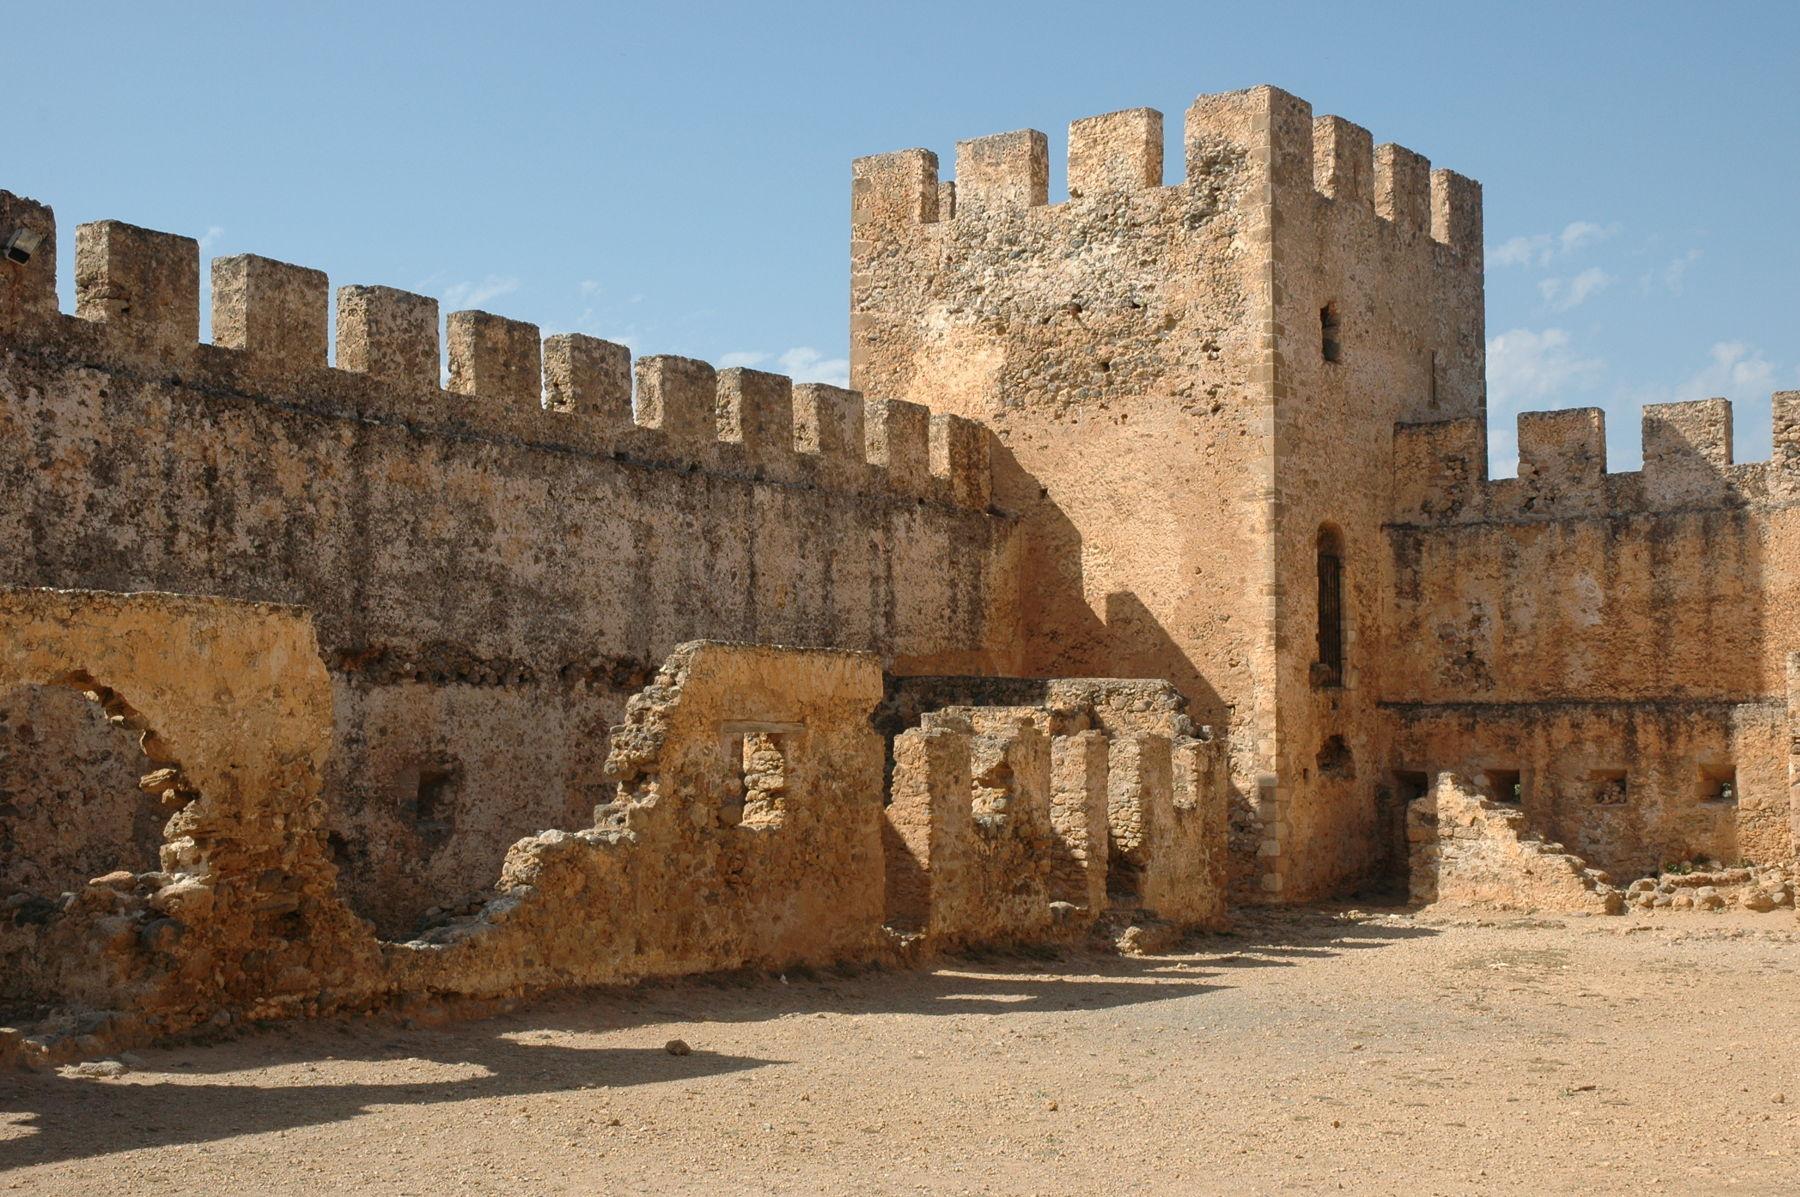 Frangokastelo castle walls